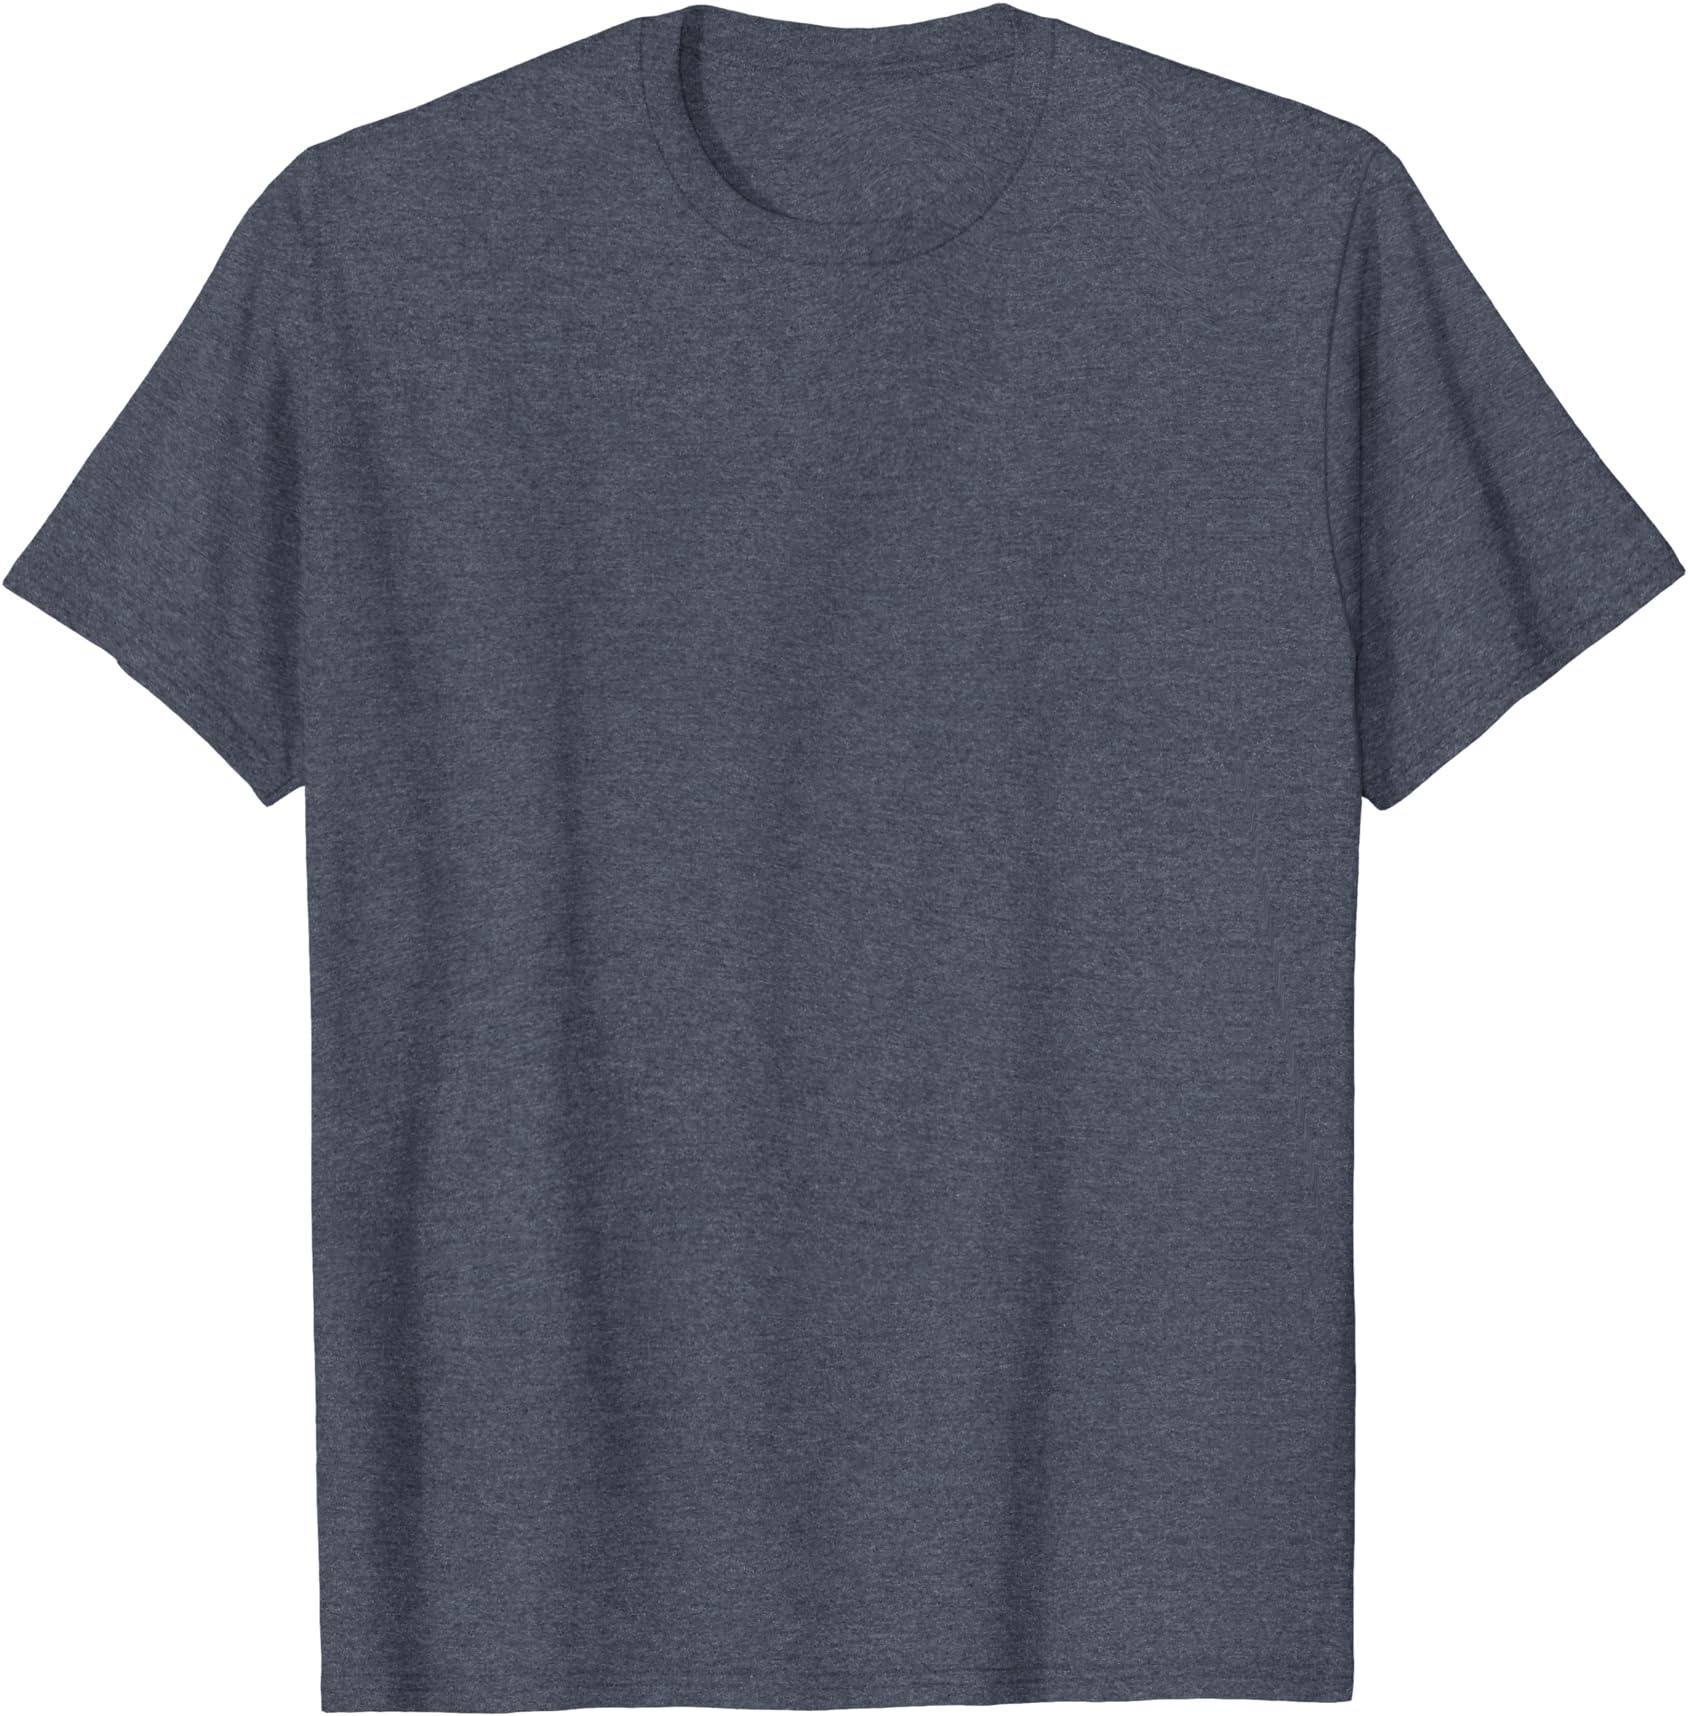 Any Year Legendary Since Funny Novelty T-Shirt Mens tee TShirt